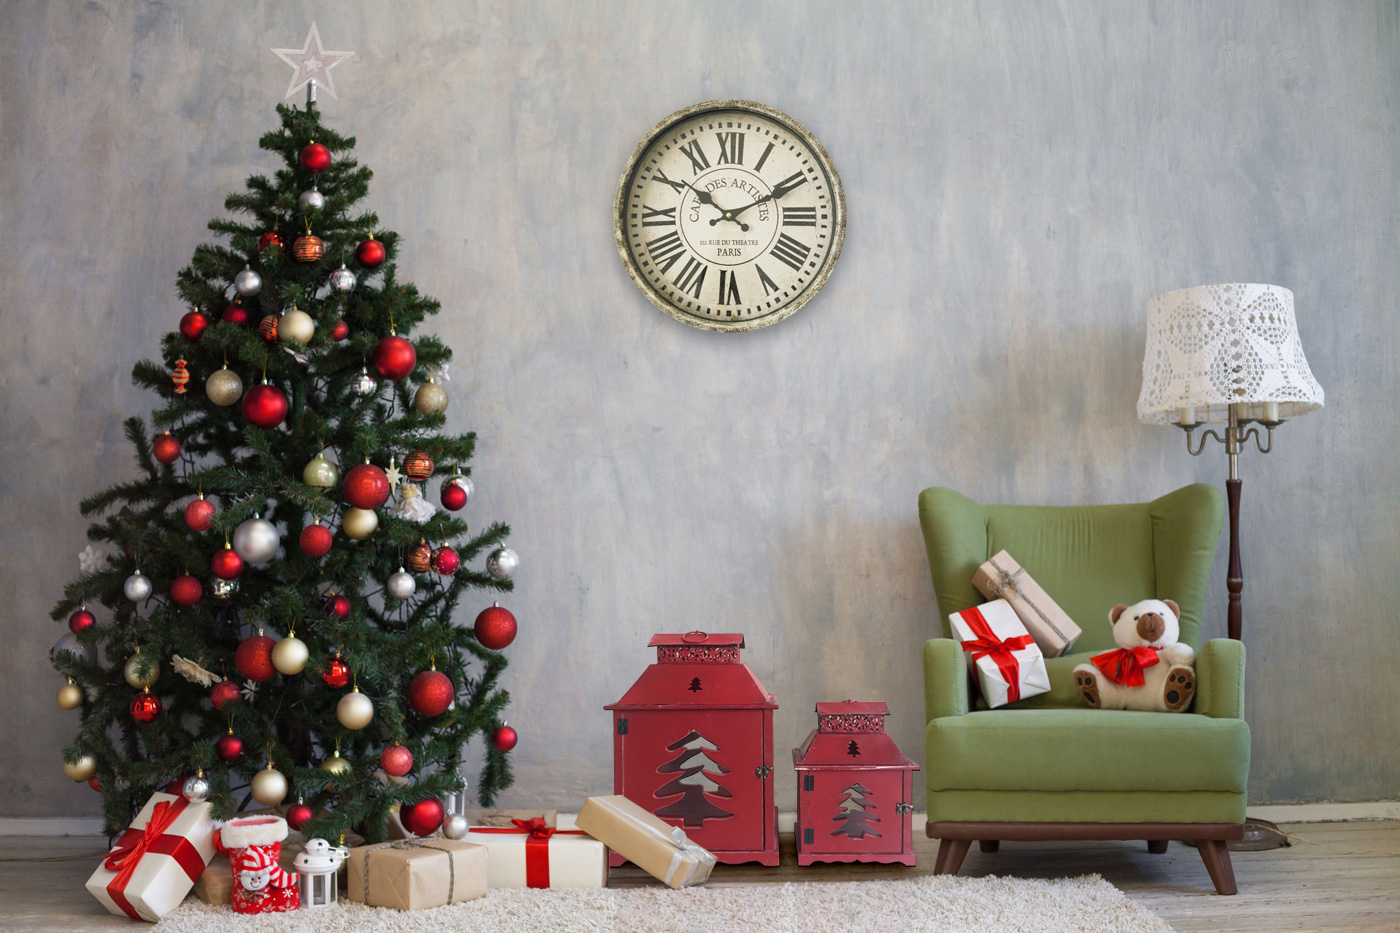 Lanterne decorative rosse per Natale